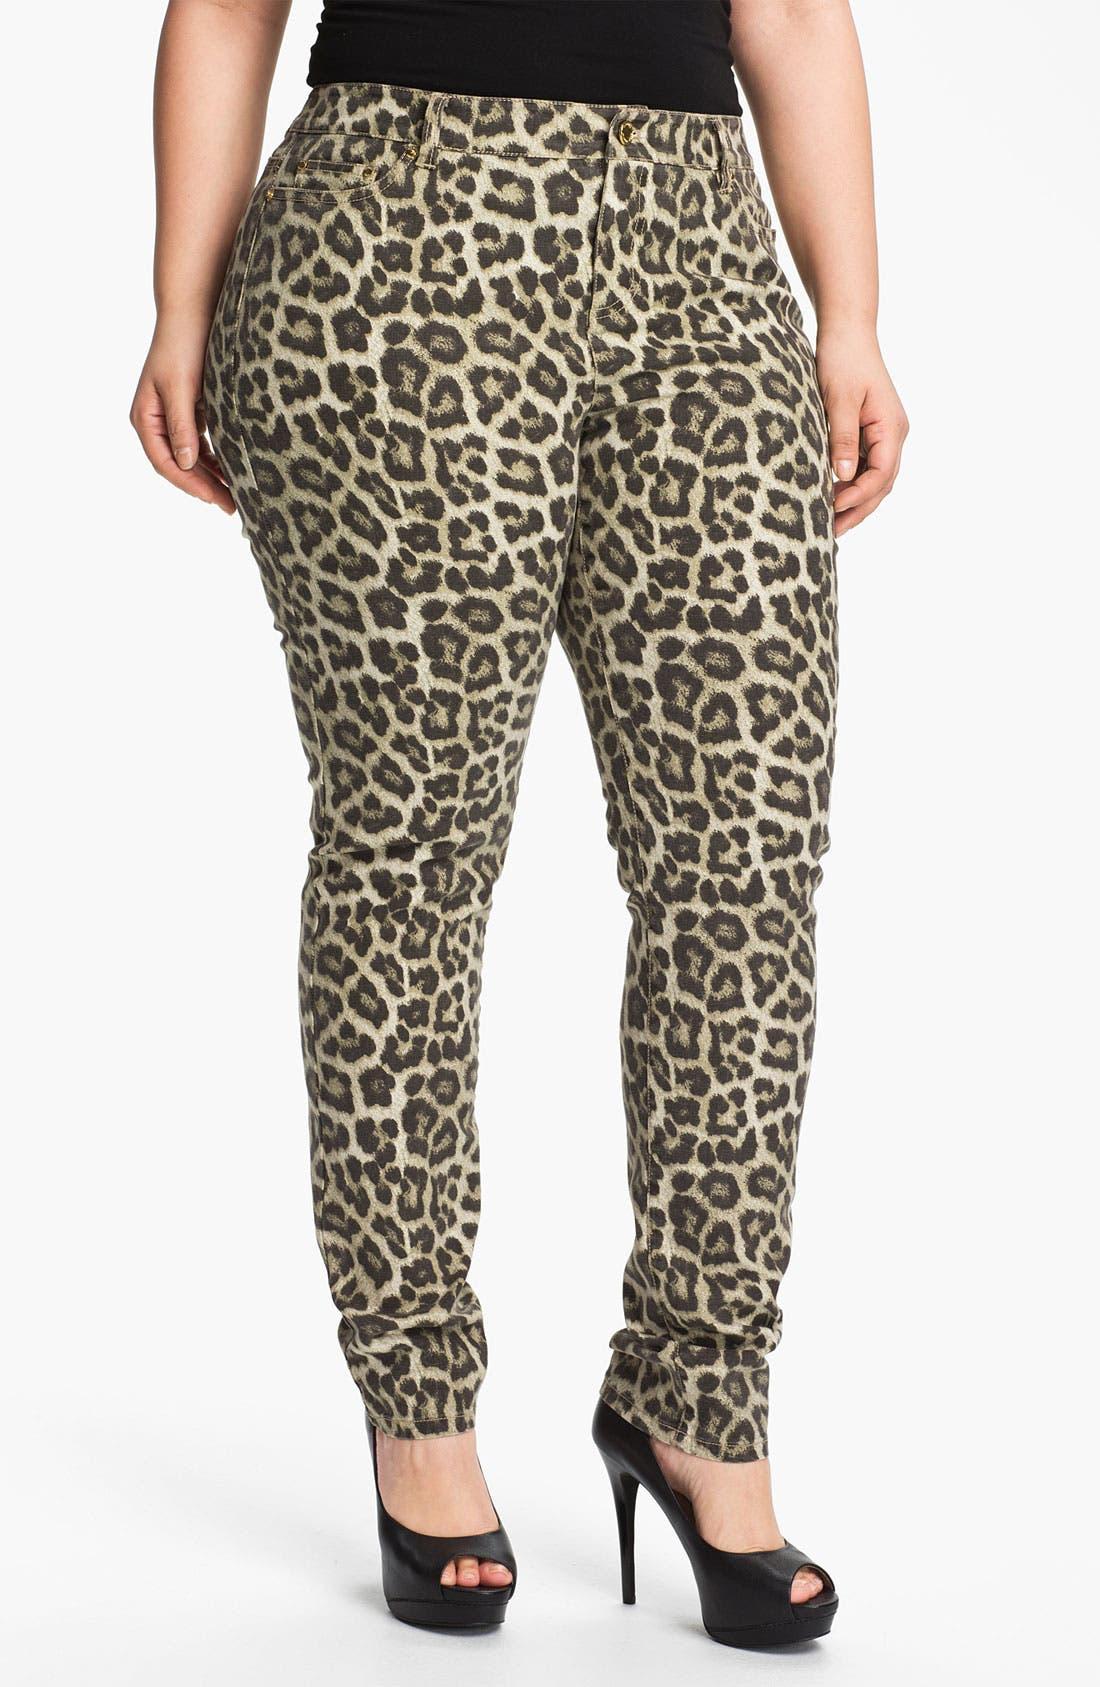 Main Image - MICHAEL Michael Kors 'Savannah' Leopard Print Skinny Jeans (Plus)